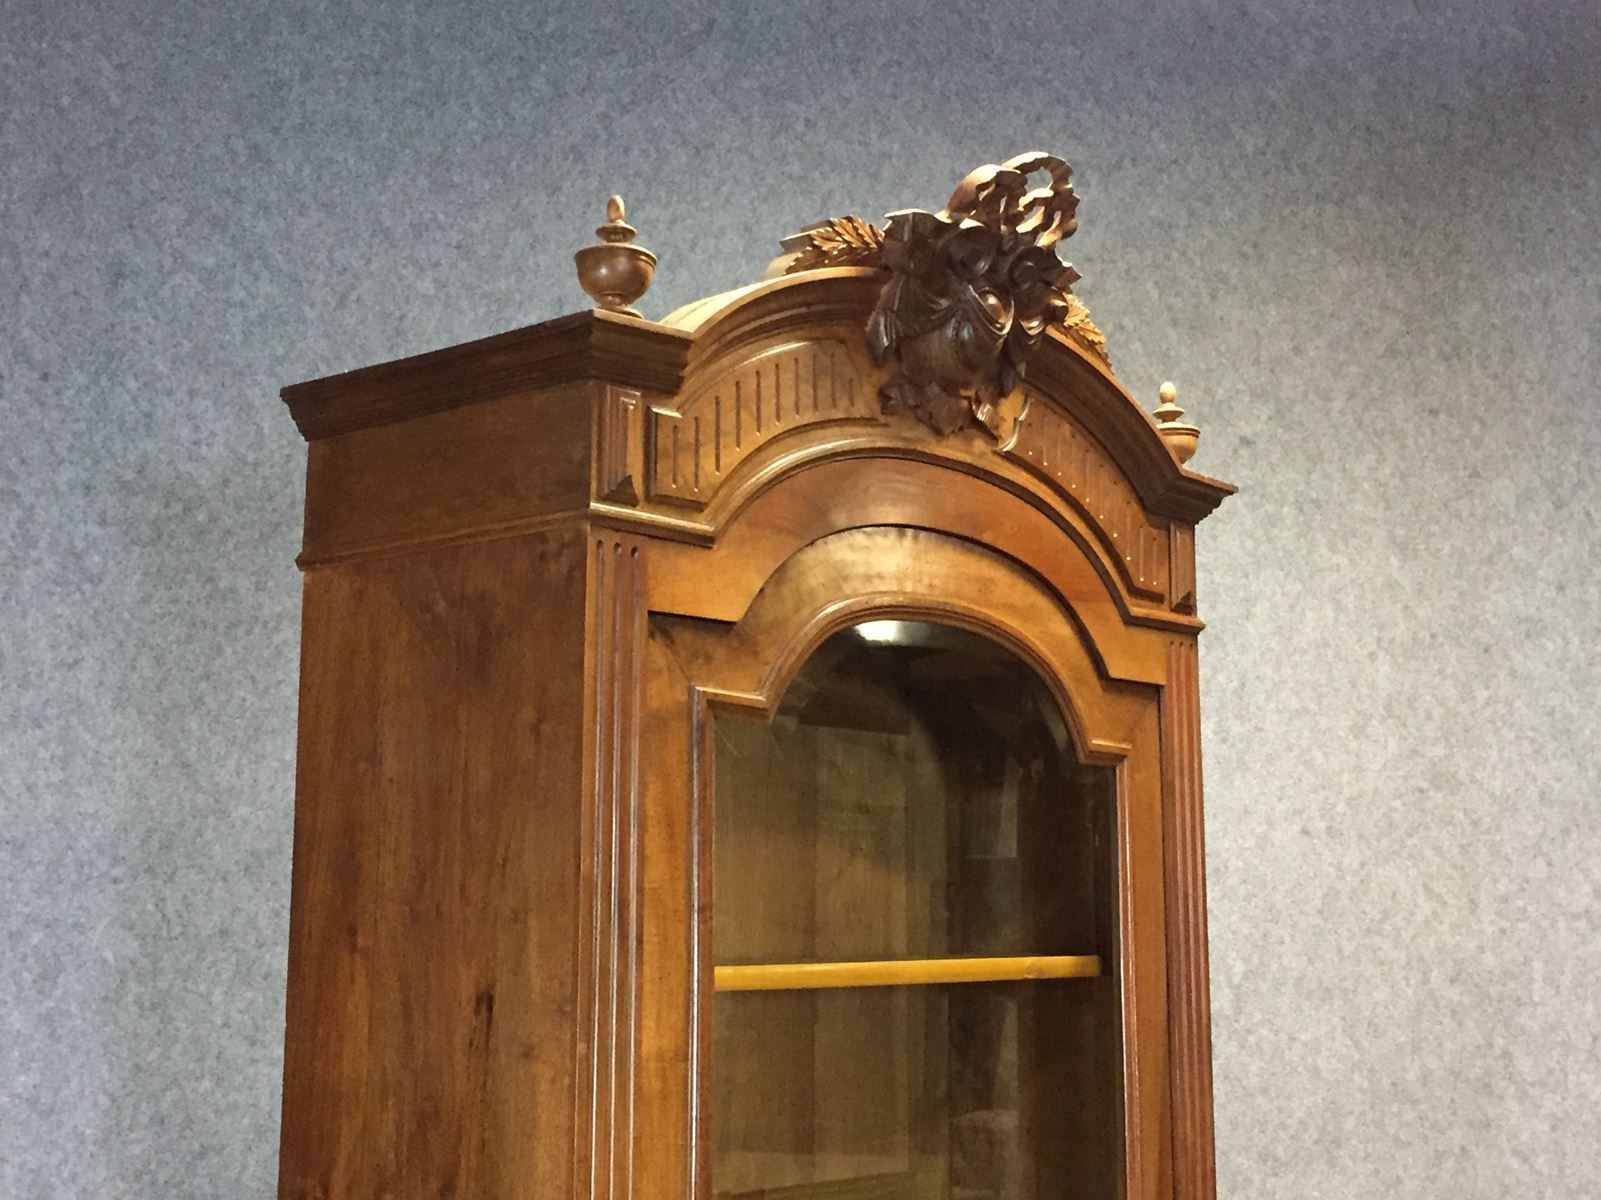 Vetrina antica in stile Luigi XVI in legno di noce in vendita su ...